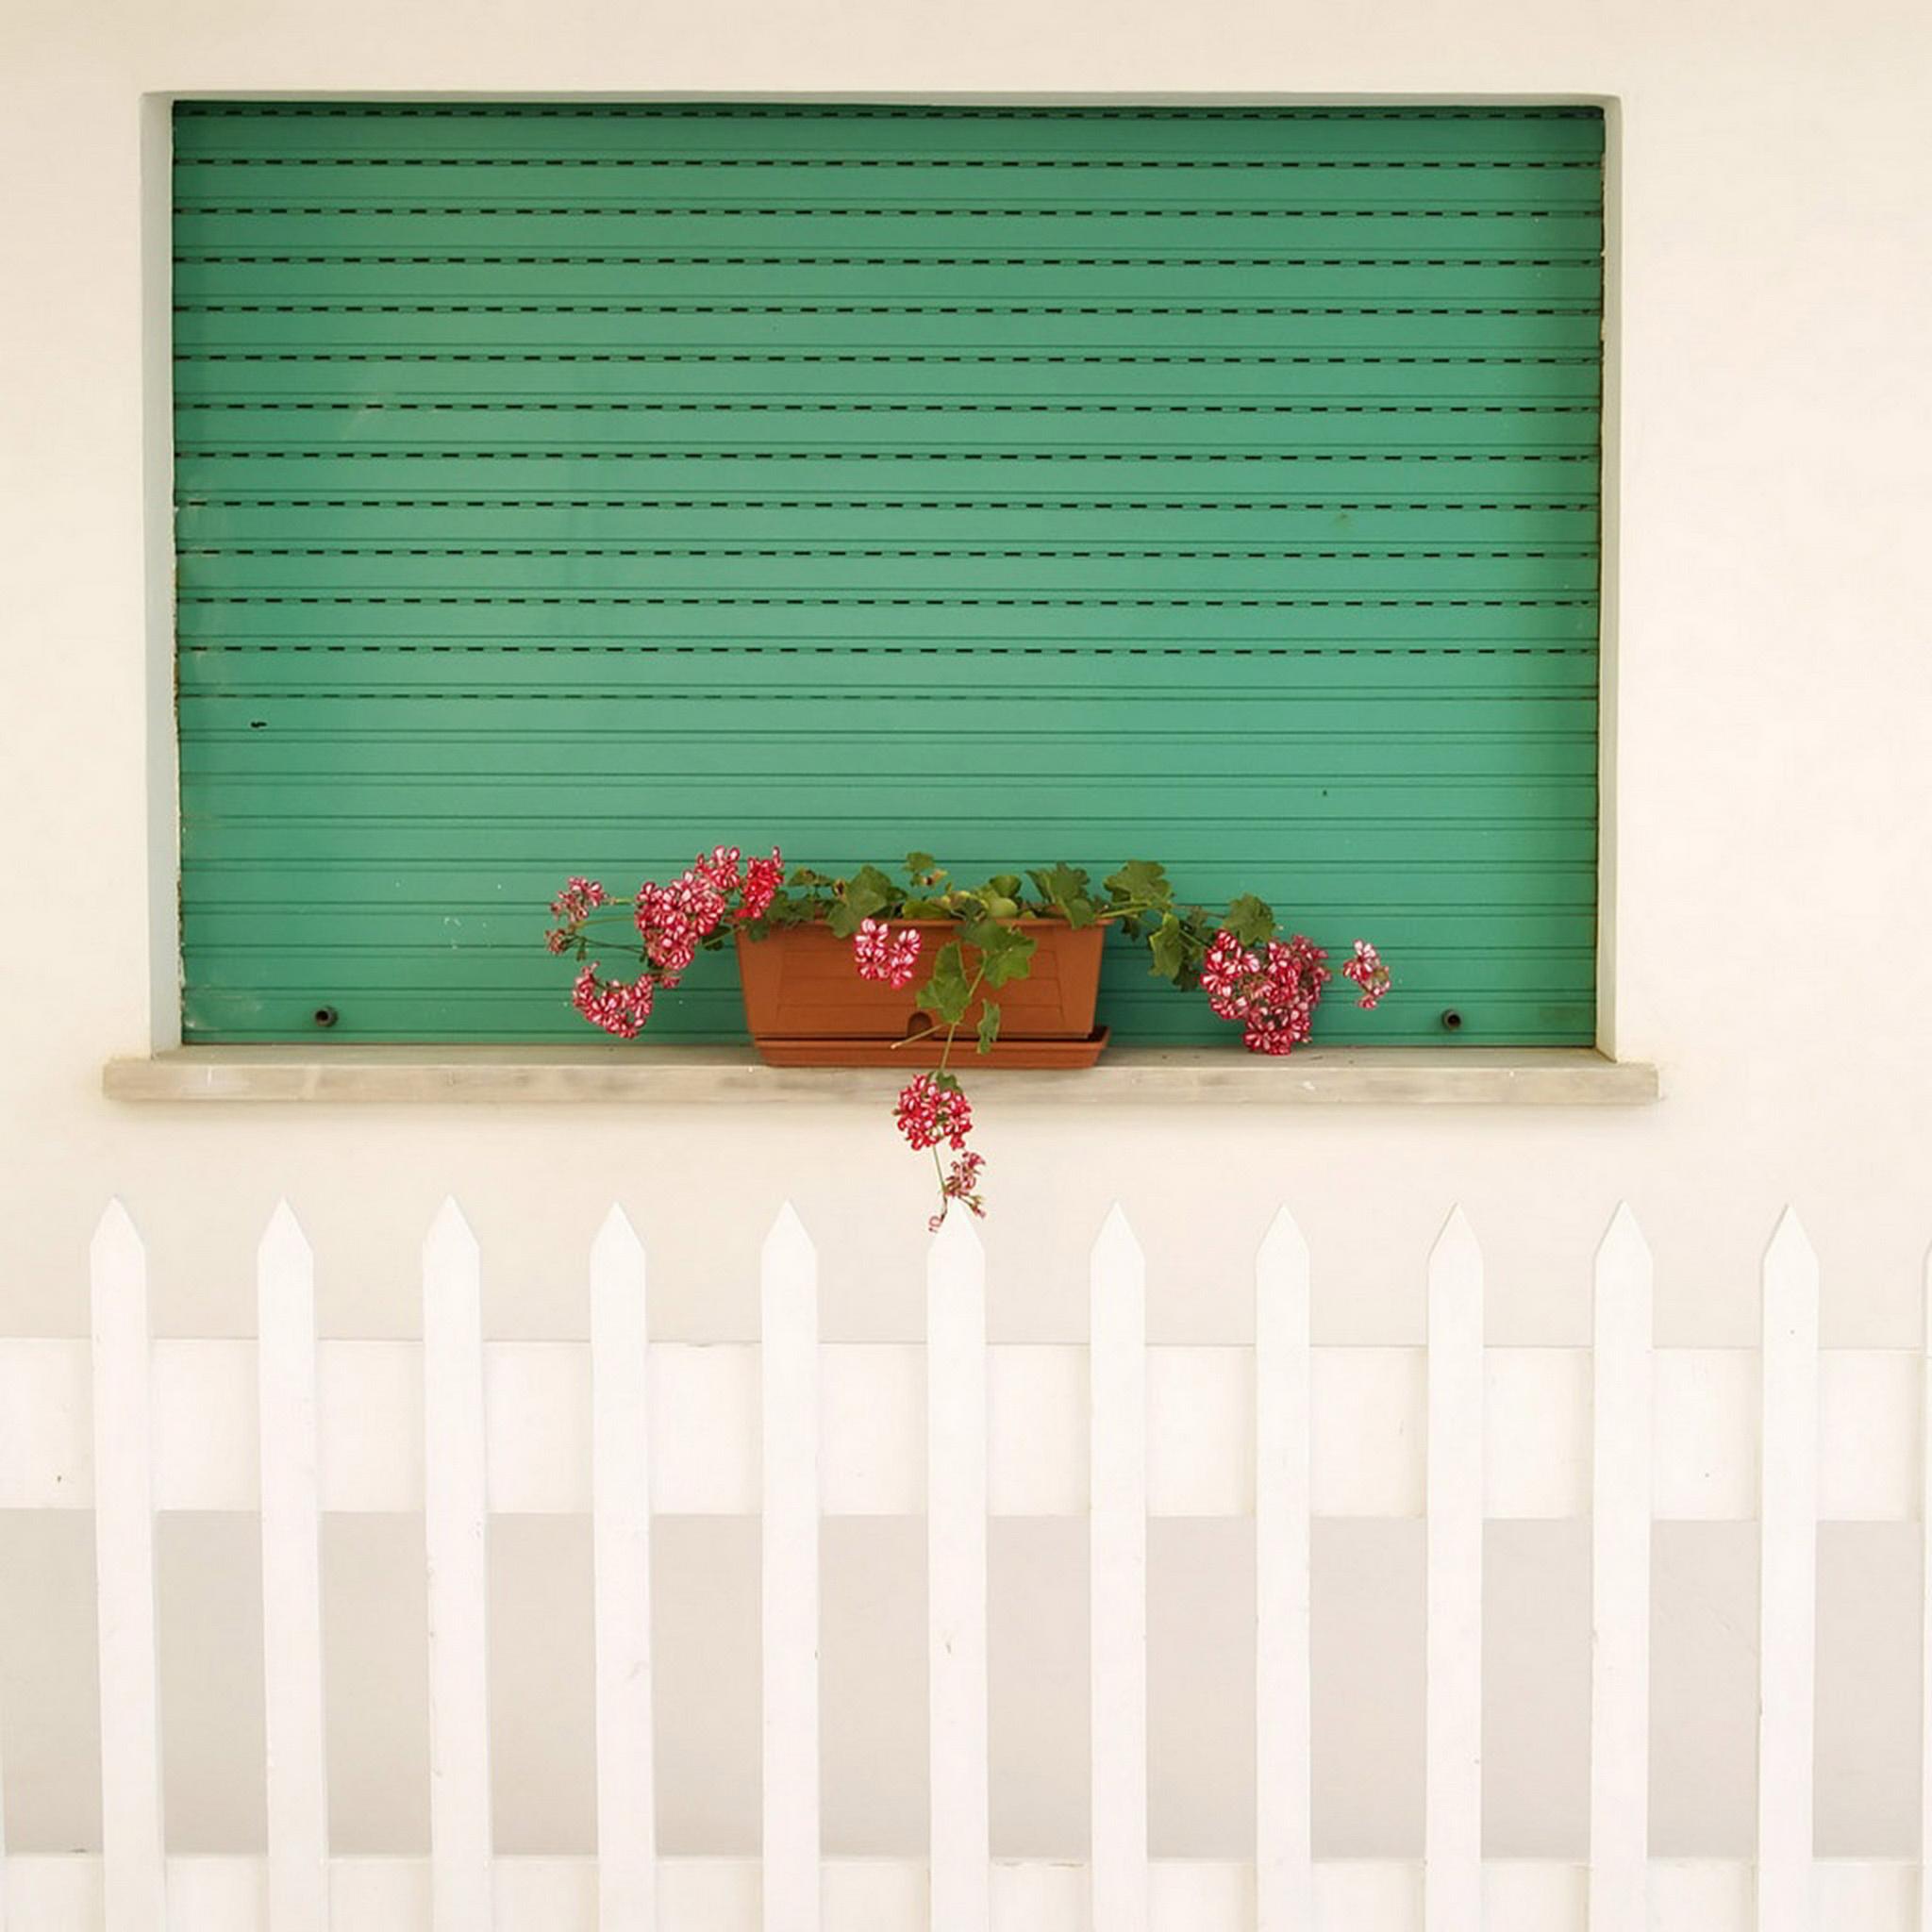 Green-Windows-3Wallpapers-iPad-Retina